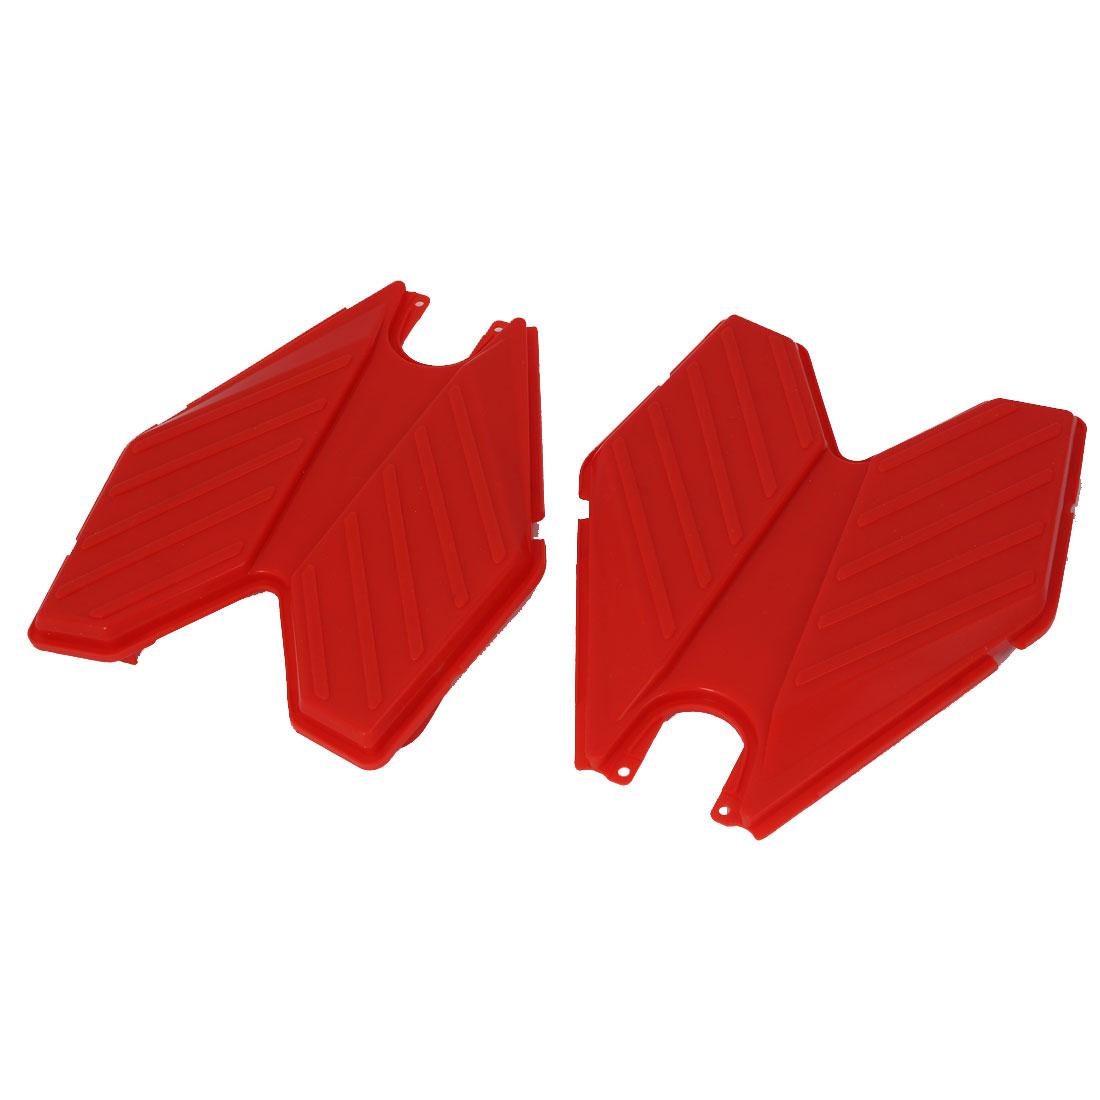 Swing Plasma Car Silicon Transformers Design Pedal Red 2pcs